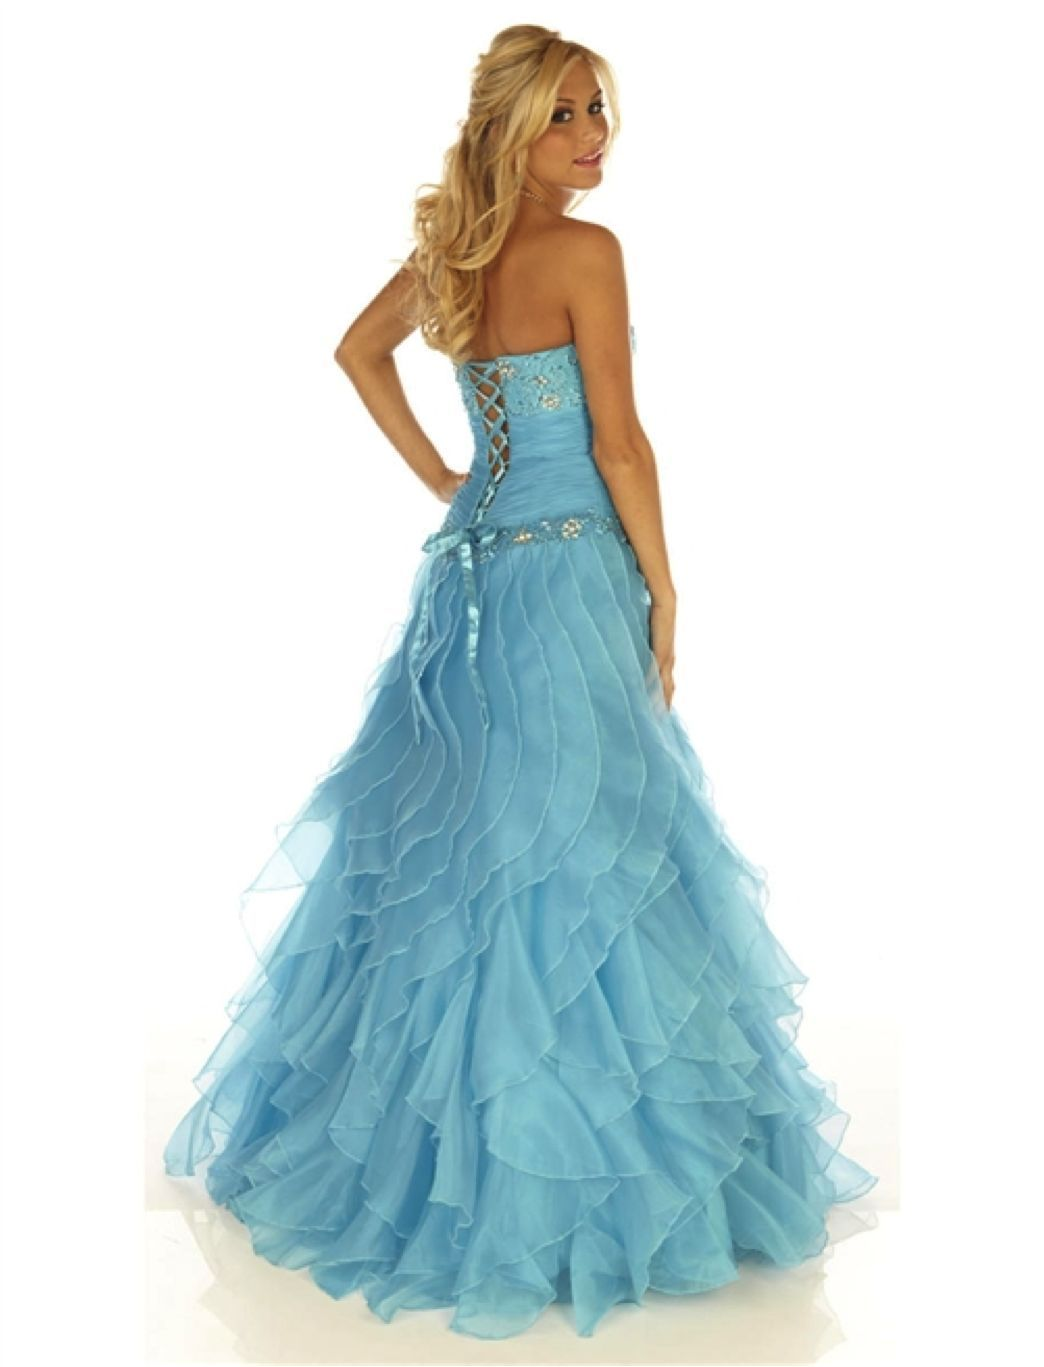 Image 3 of Sexy Strapless Corset Aqua Cinderella Mermaid Prom Evening Gown Joli 9538 12